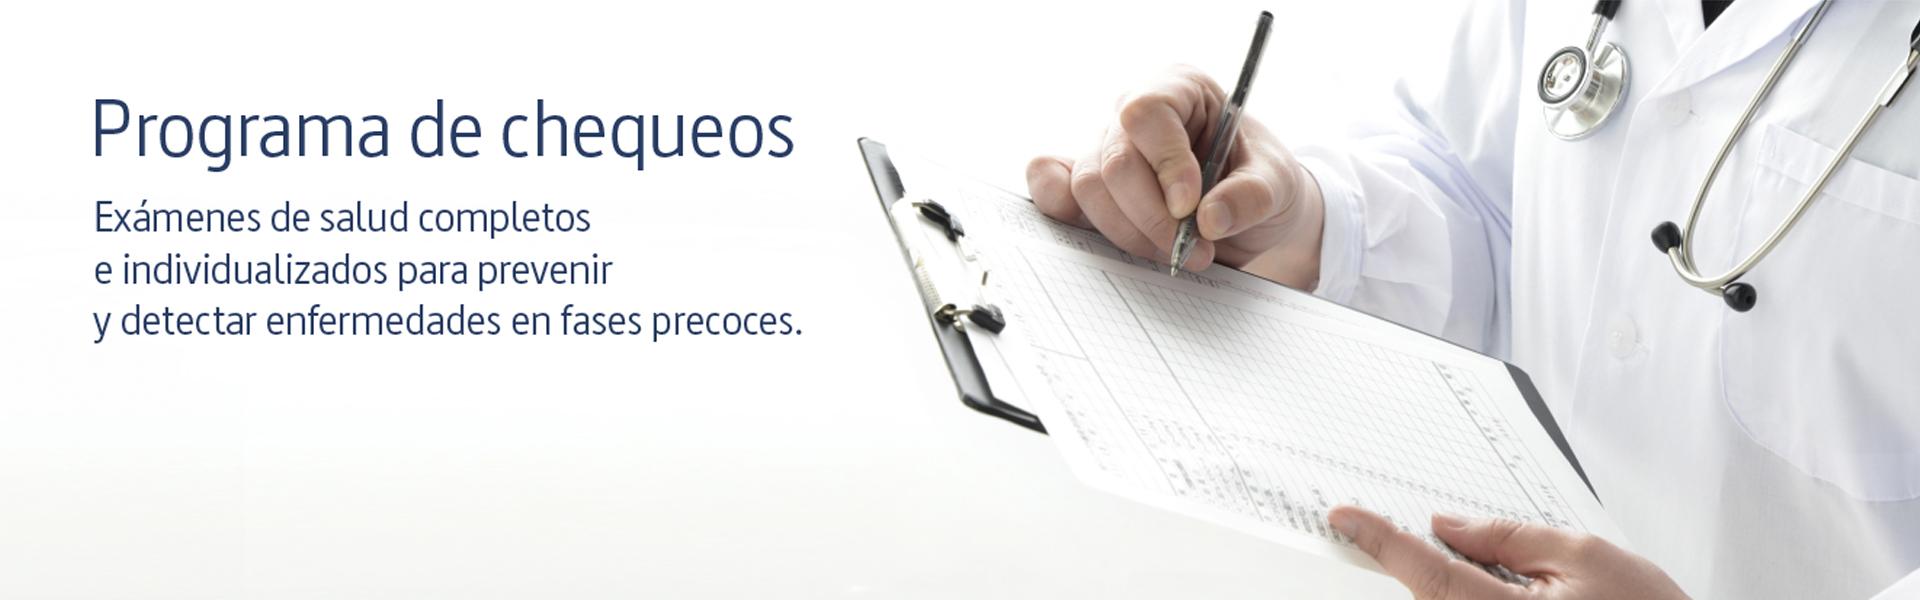 banner_chequeos